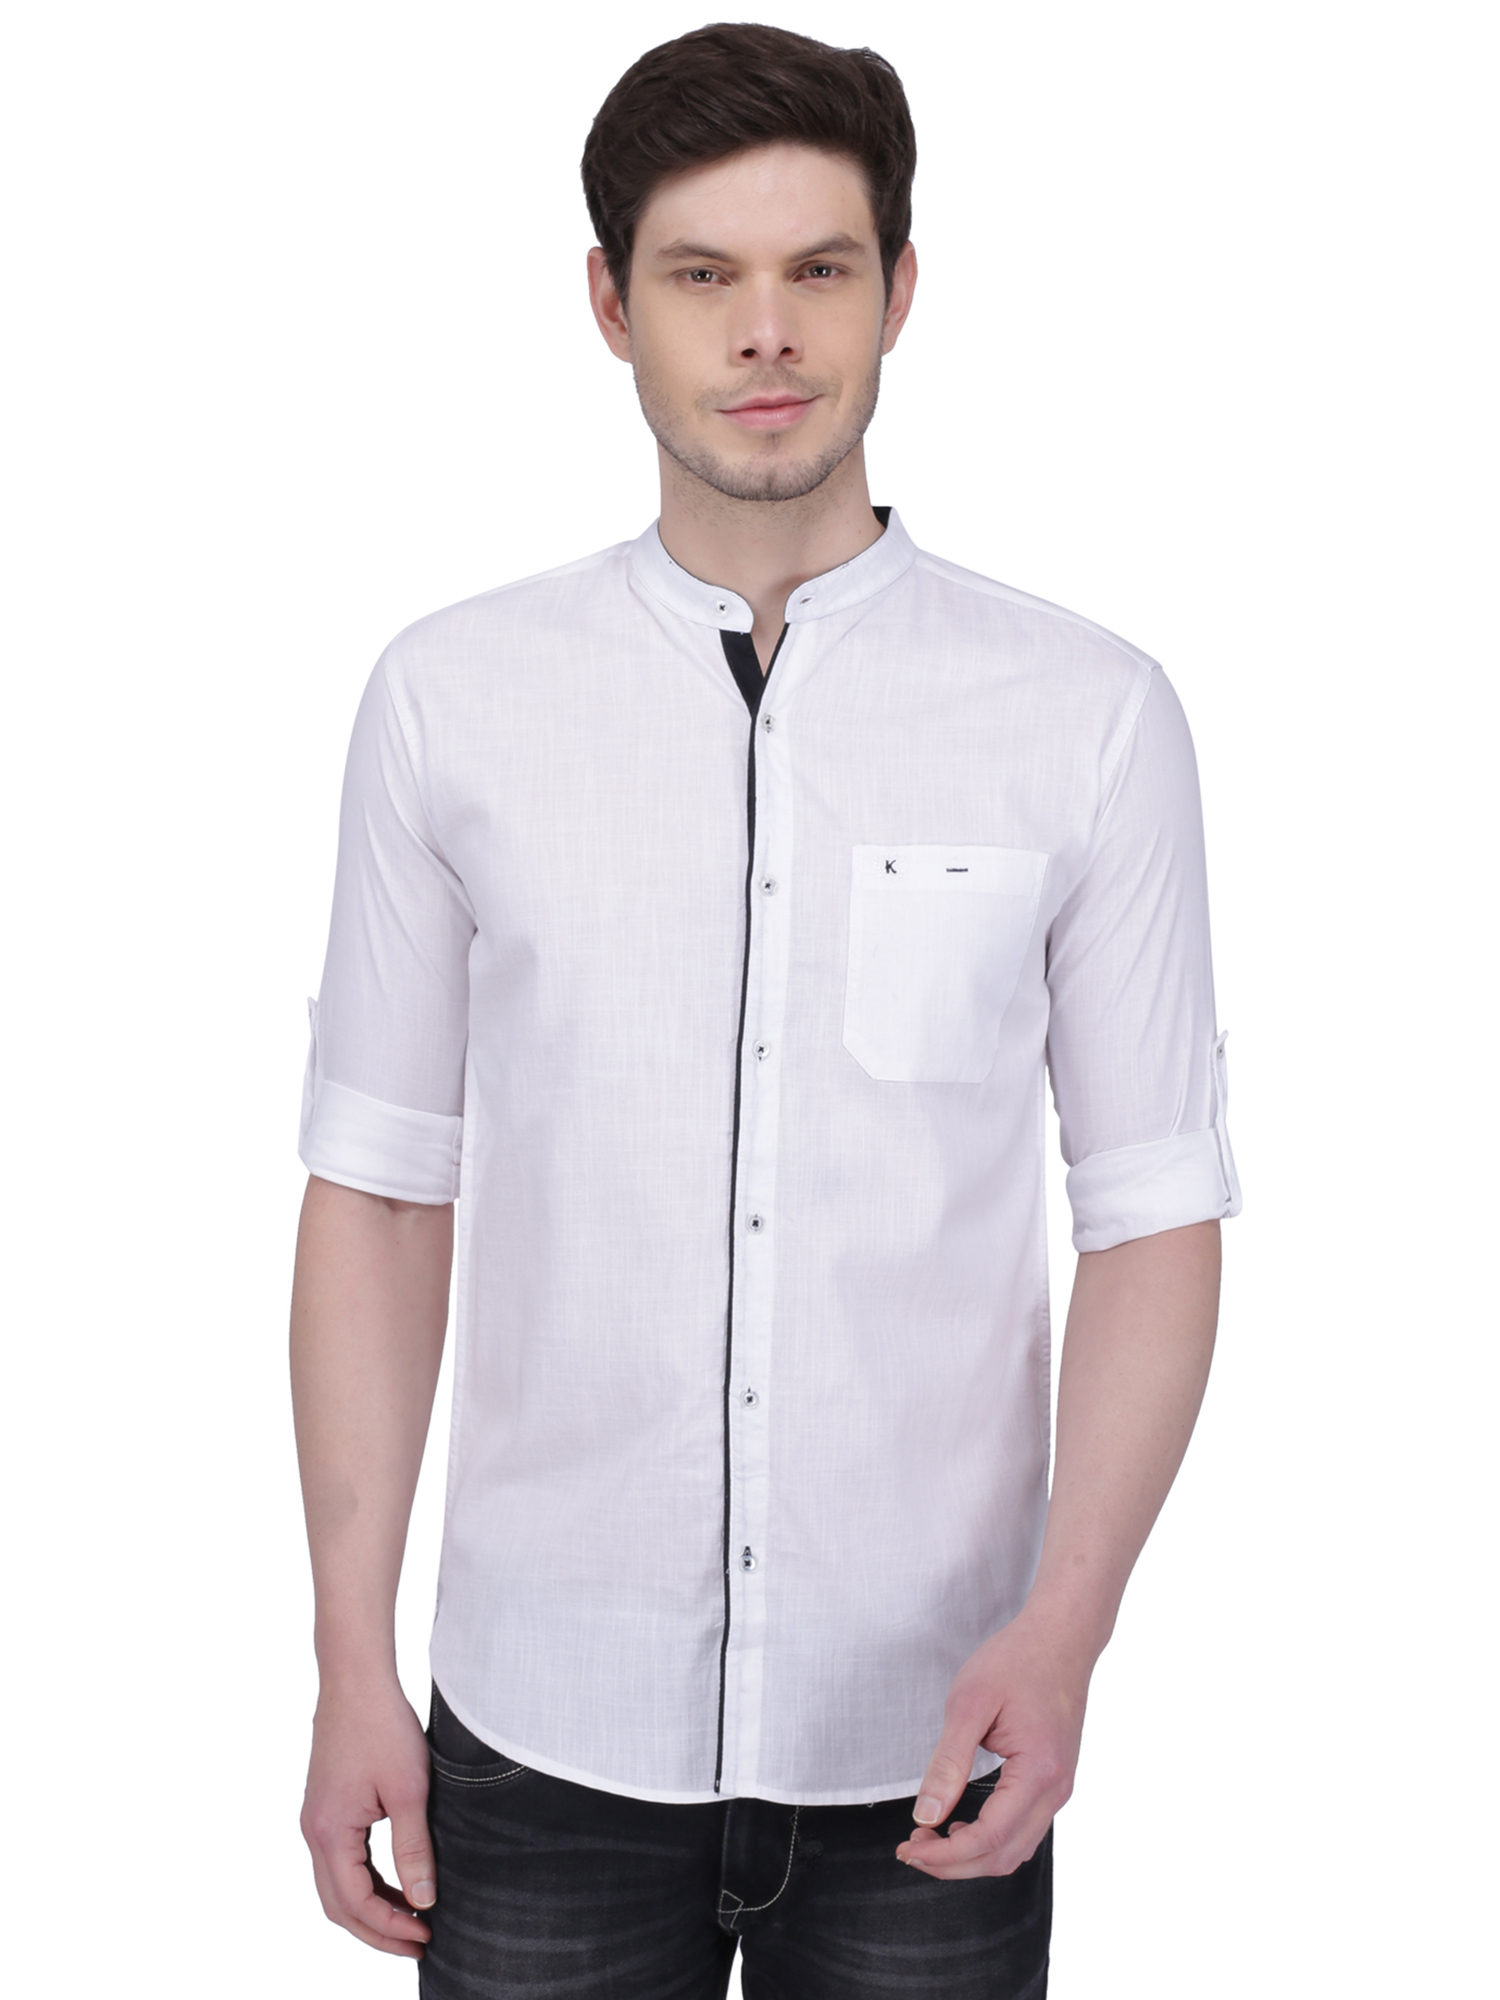 Kuons Avenue   Kuons Avenue Men's White Linen Cotton Casual Shirt- KACLFS1292WH